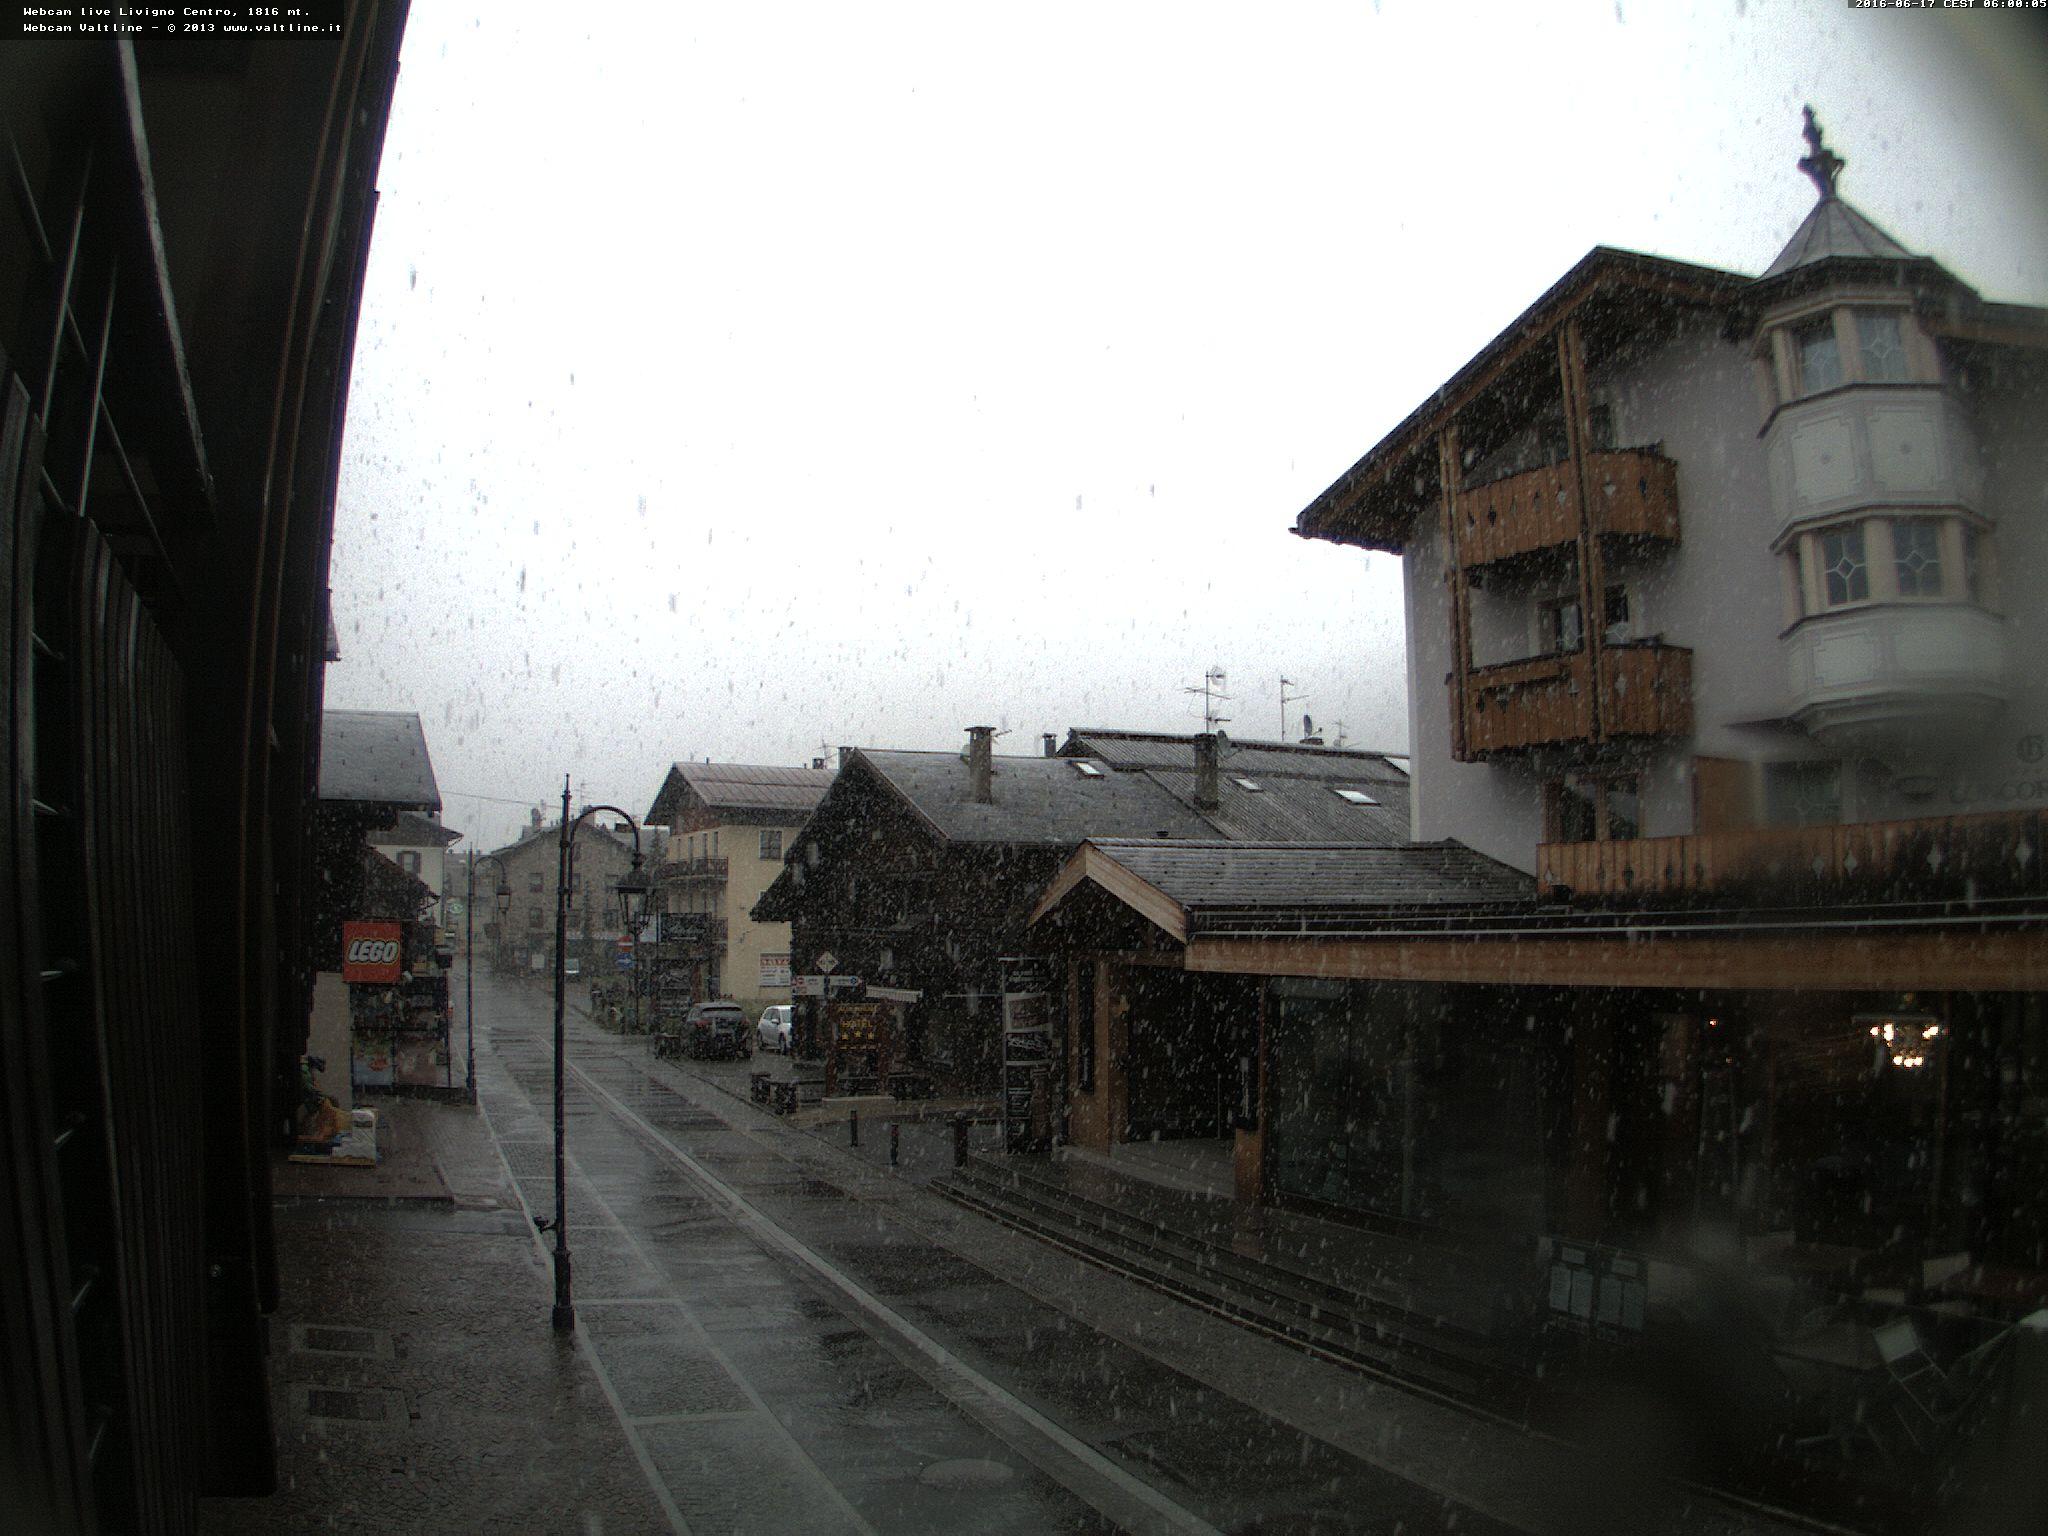 Nowcasting nivo-glaciale Alpi estate 2016!-livigno-17.06.2016.jpg